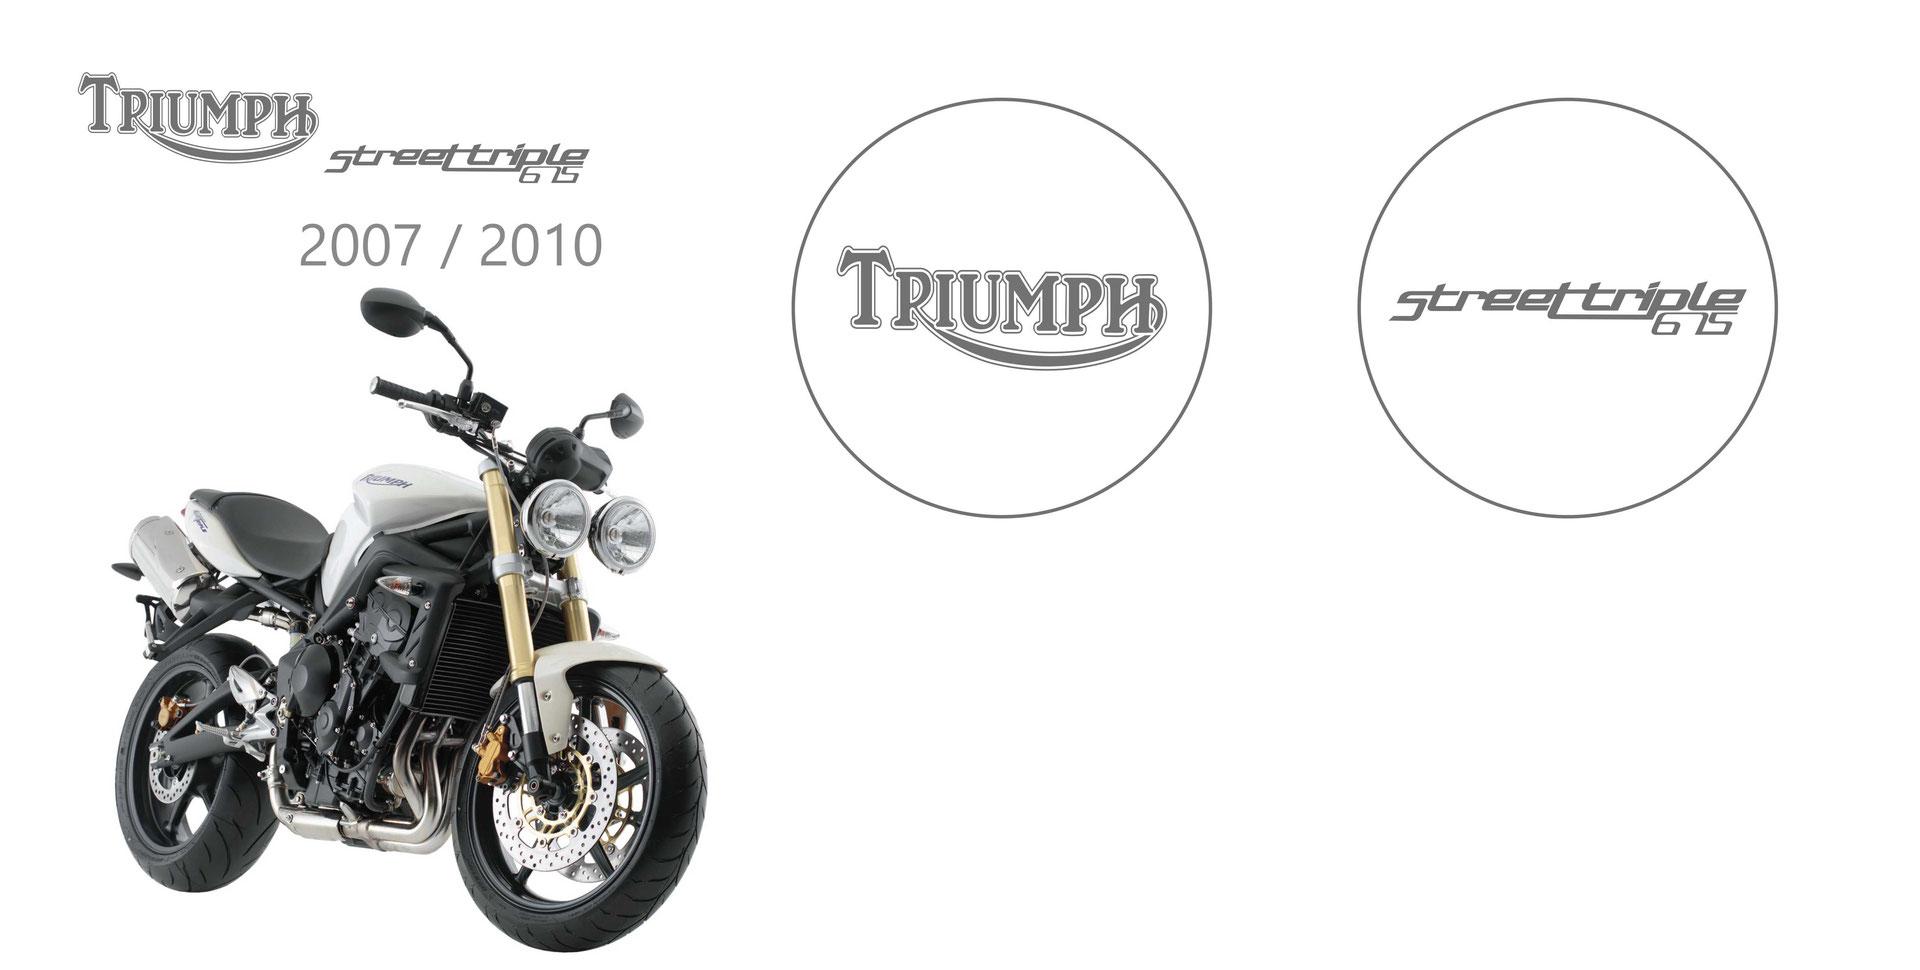 triumph street triple 2007-2010